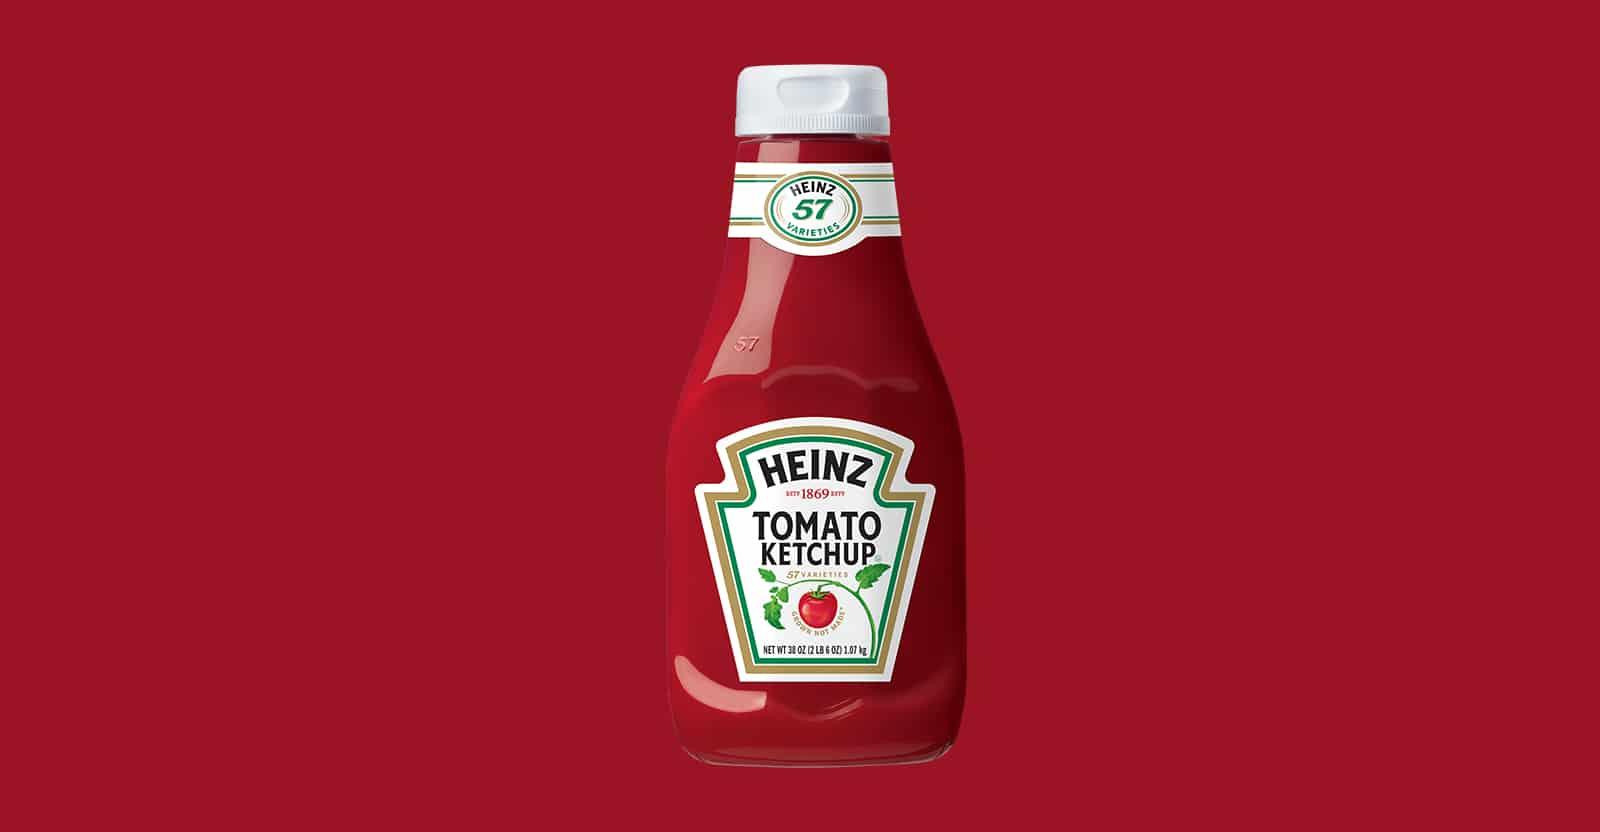 is heinz ketchup gluten-free